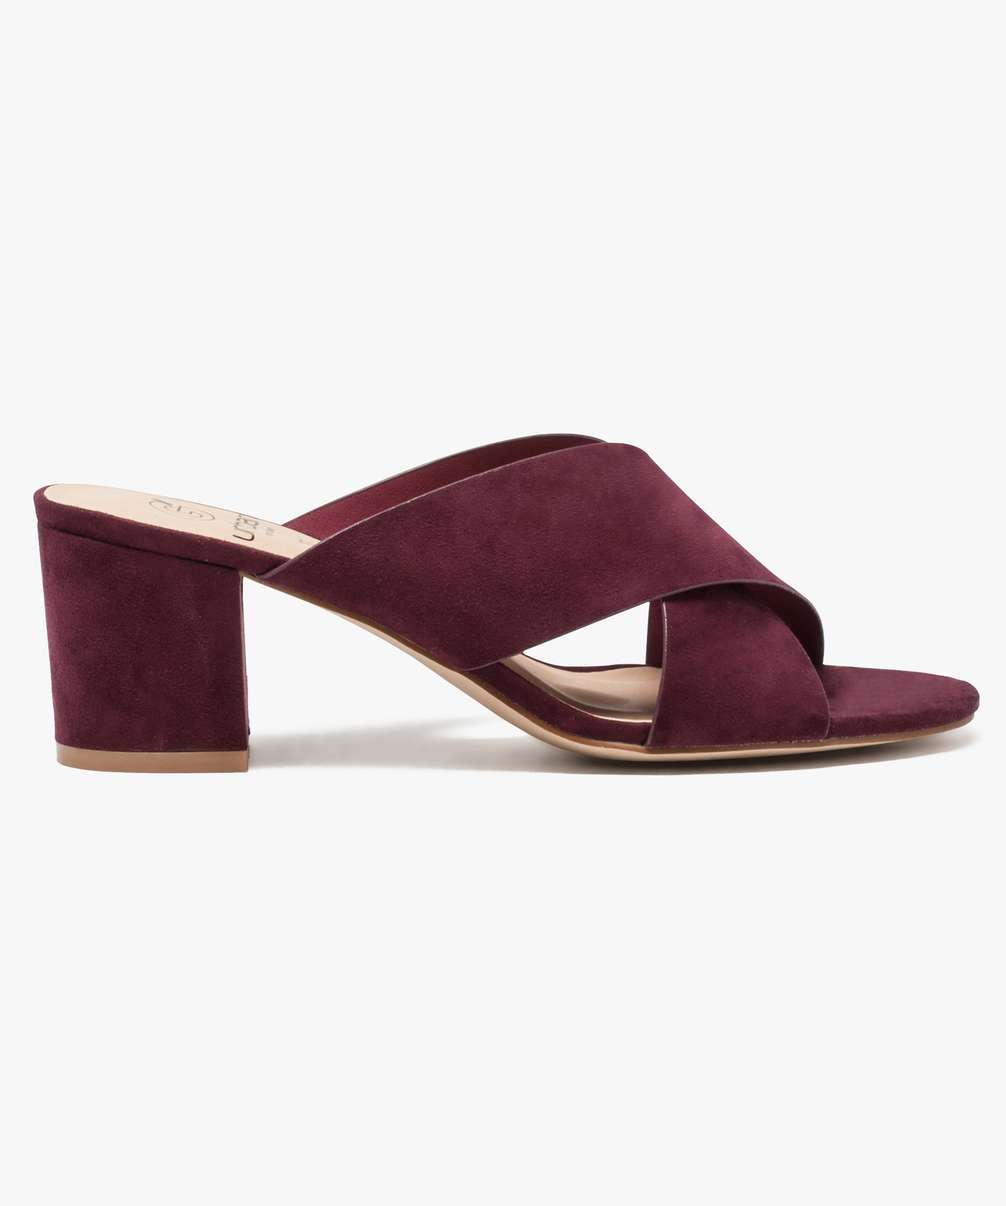 chaussures femme ete 2017 gemo. Black Bedroom Furniture Sets. Home Design Ideas